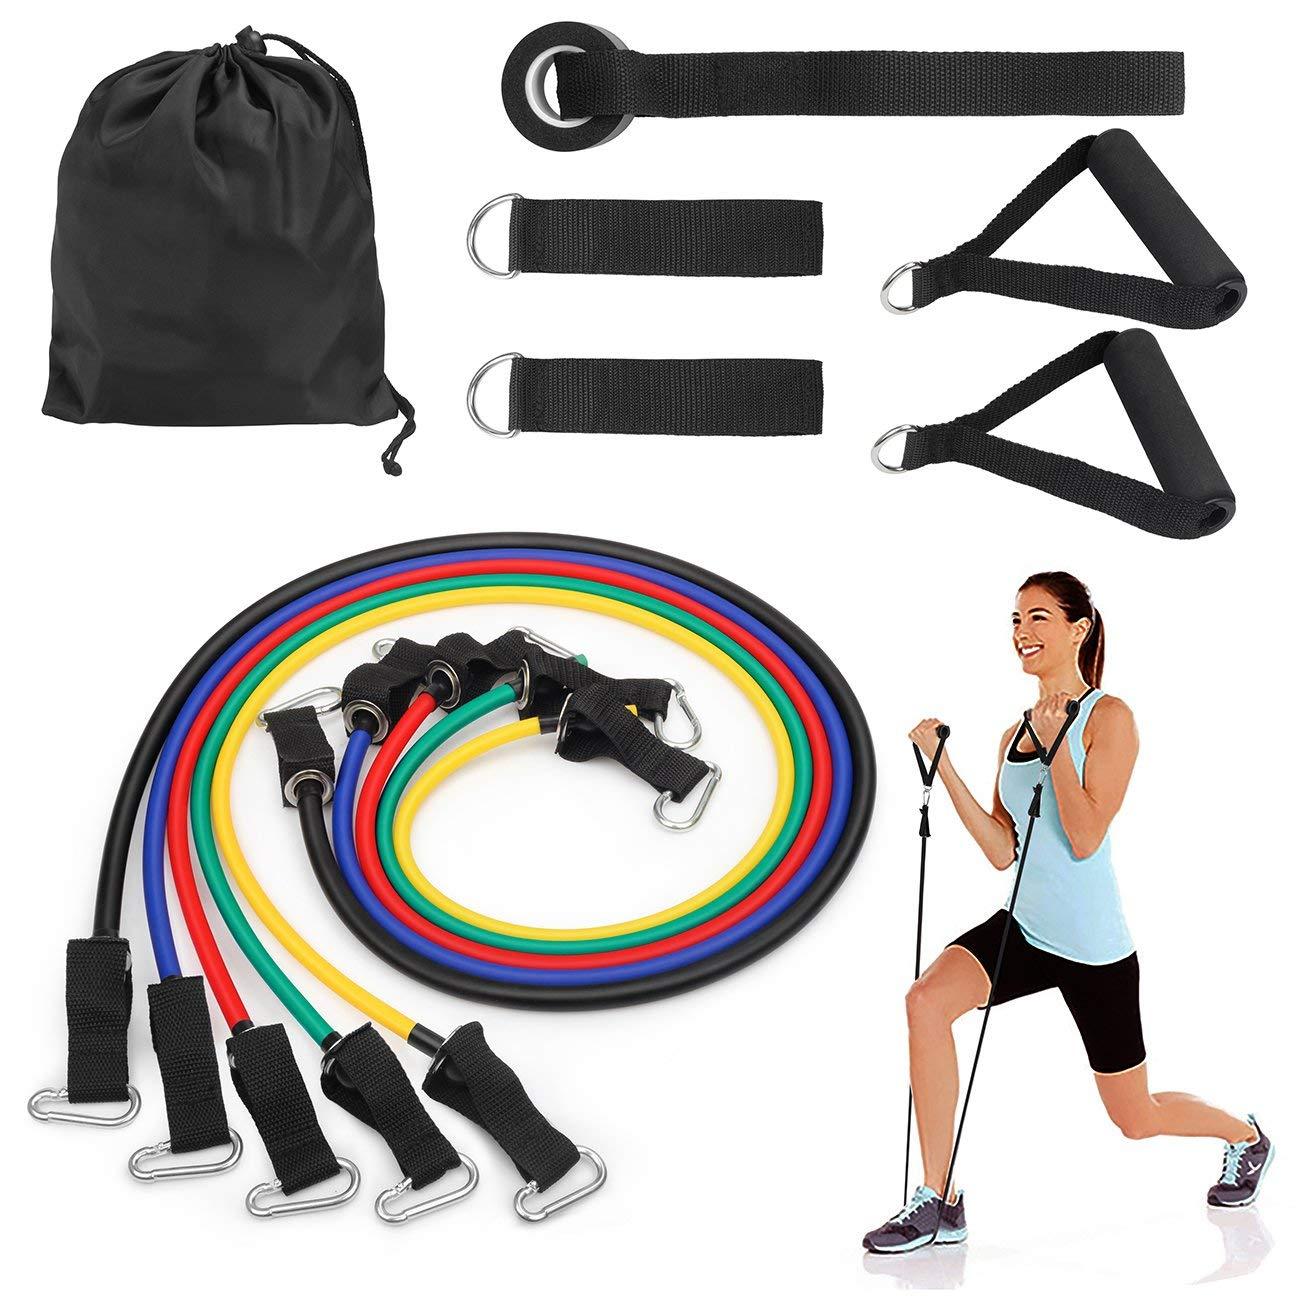 Resistance Band Exercise Set - 15.59 AC + Amazon Prime FS $15.59